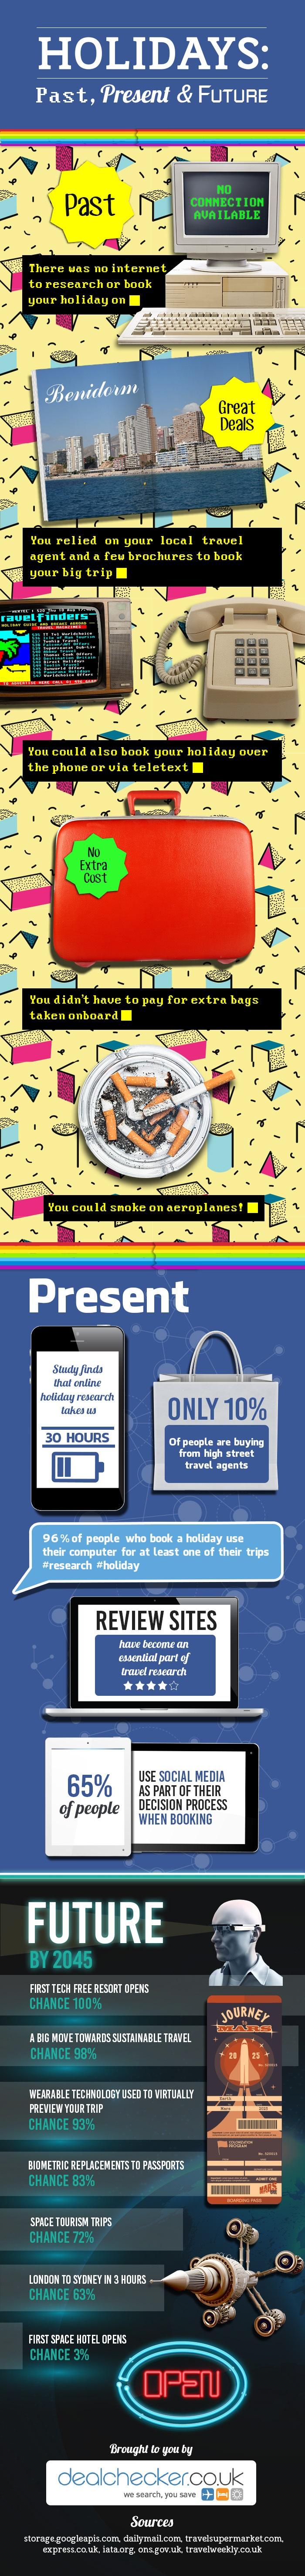 Holidays: Past, Present & Future